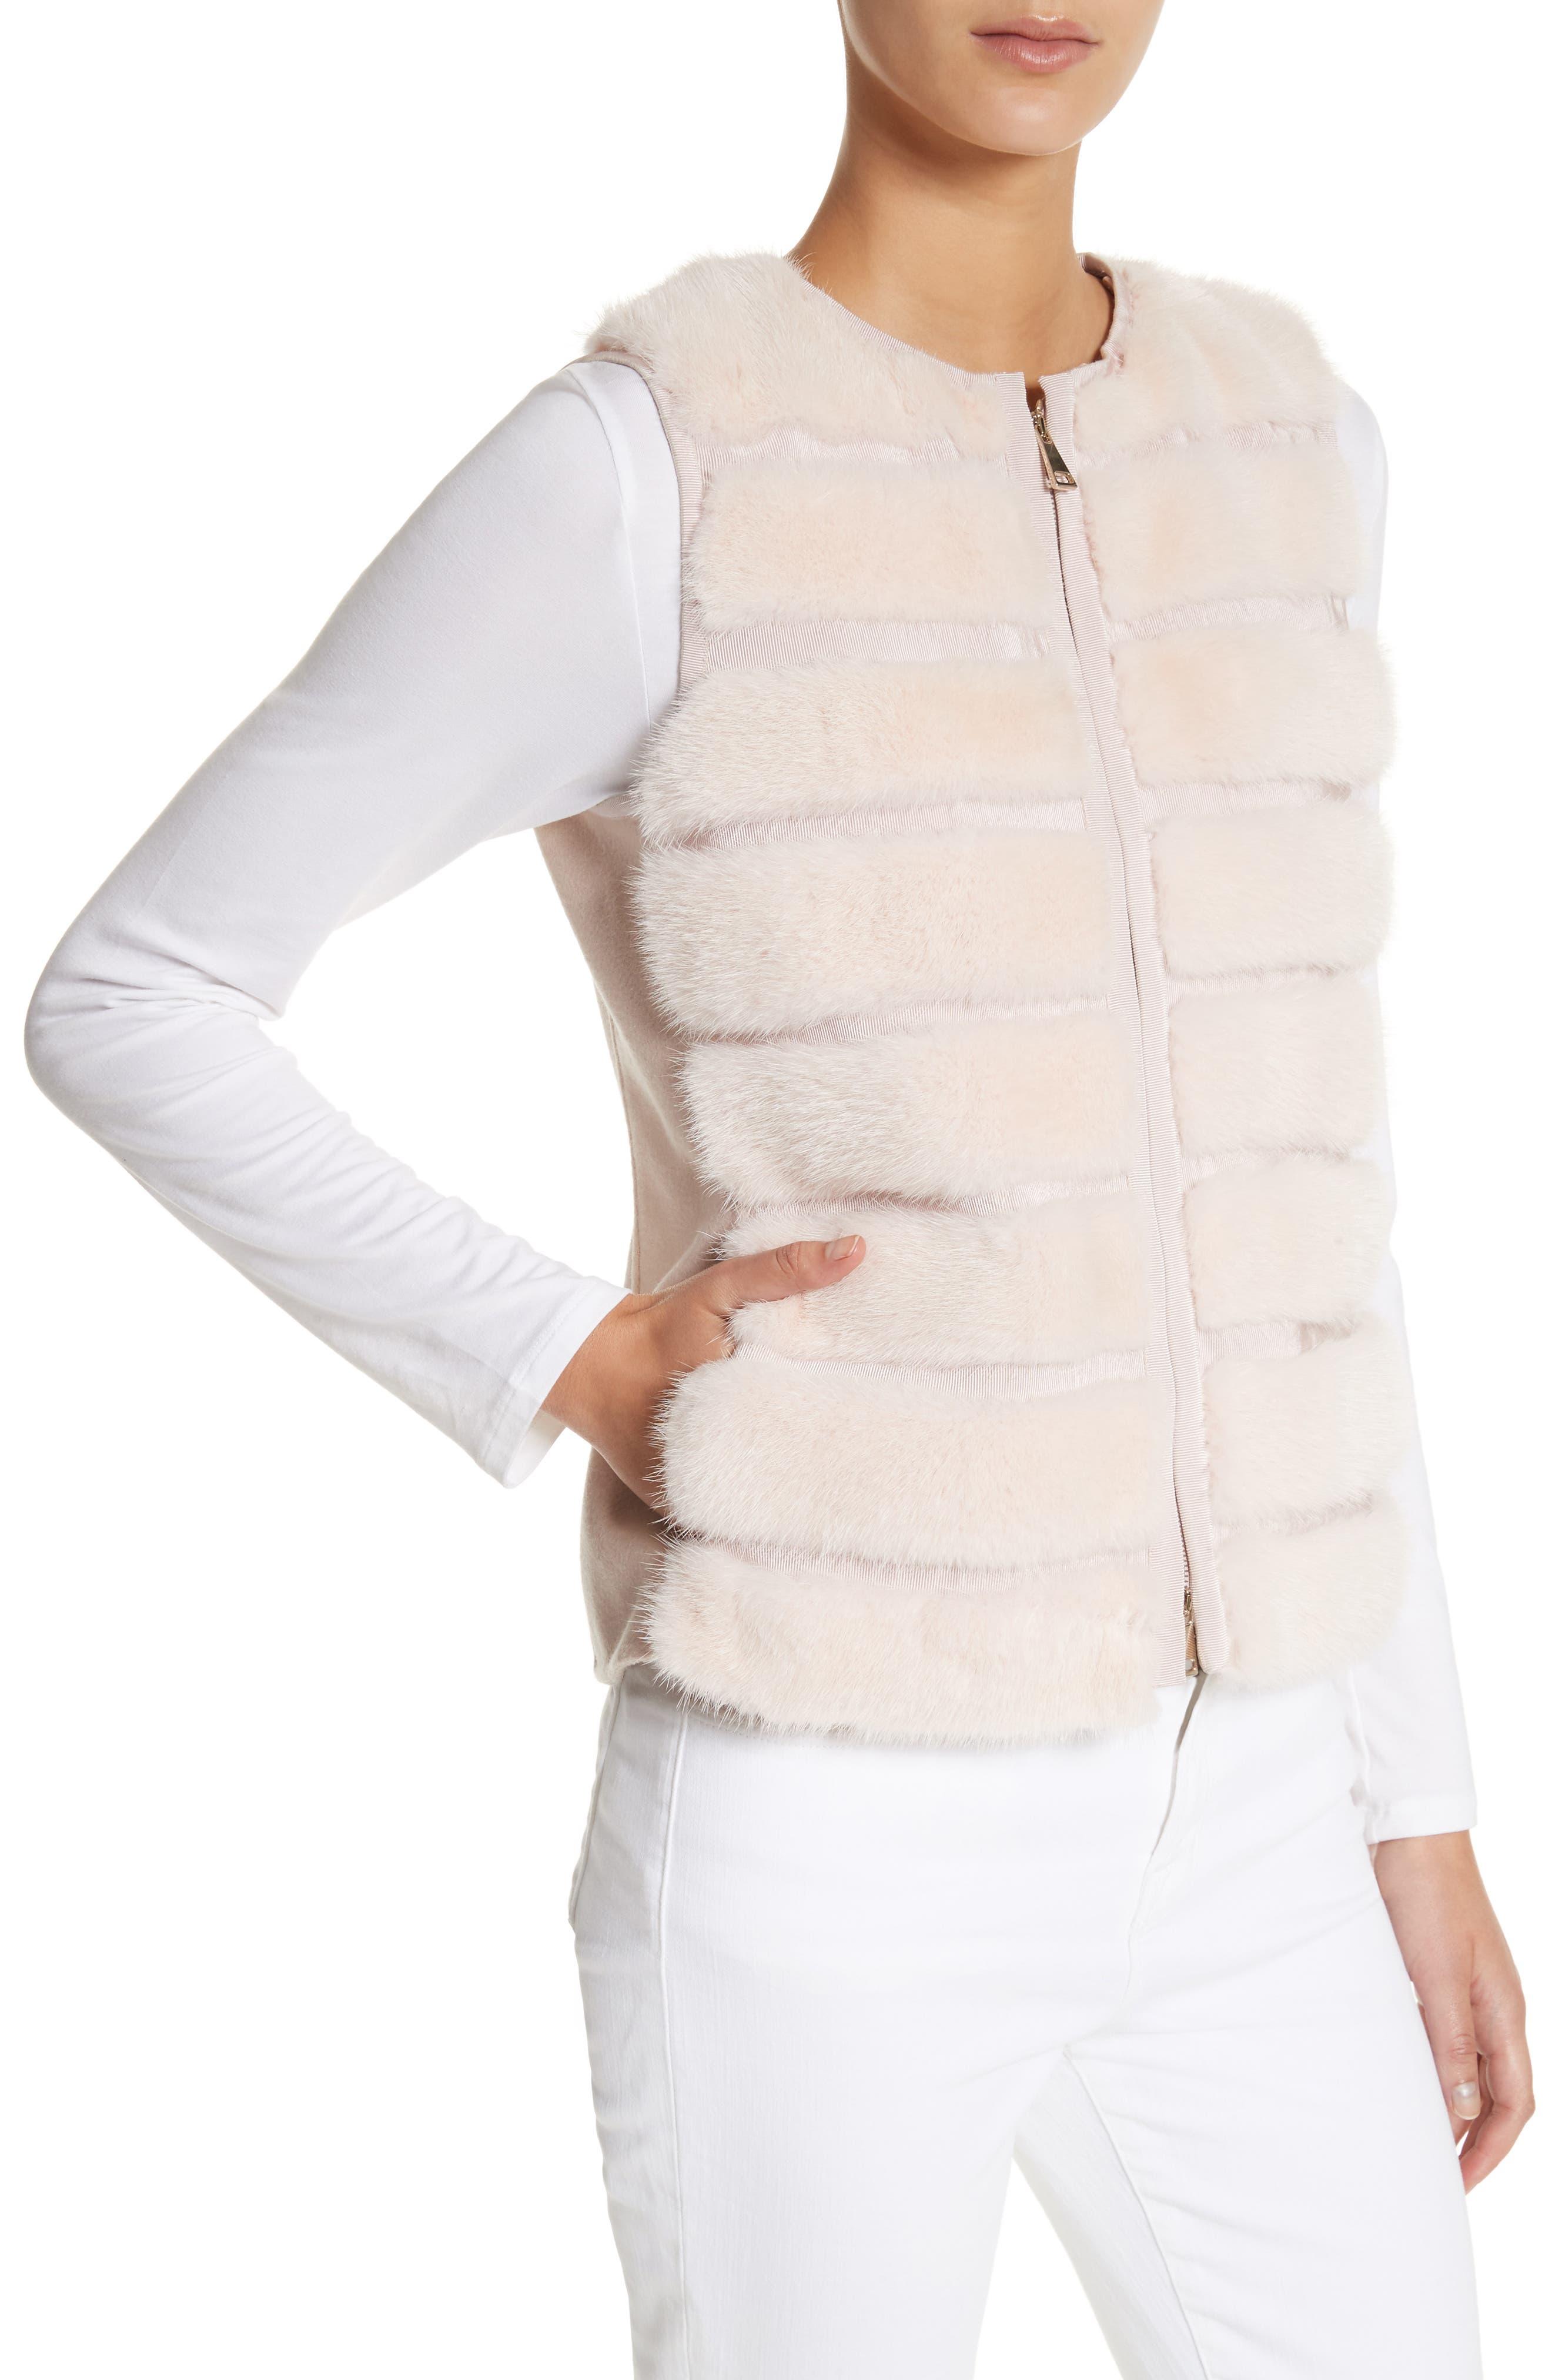 Ametrine Wool & Cashmere Vest with Genuine Mink Fur Trim & Removable Hood,                             Alternate thumbnail 4, color,                             680